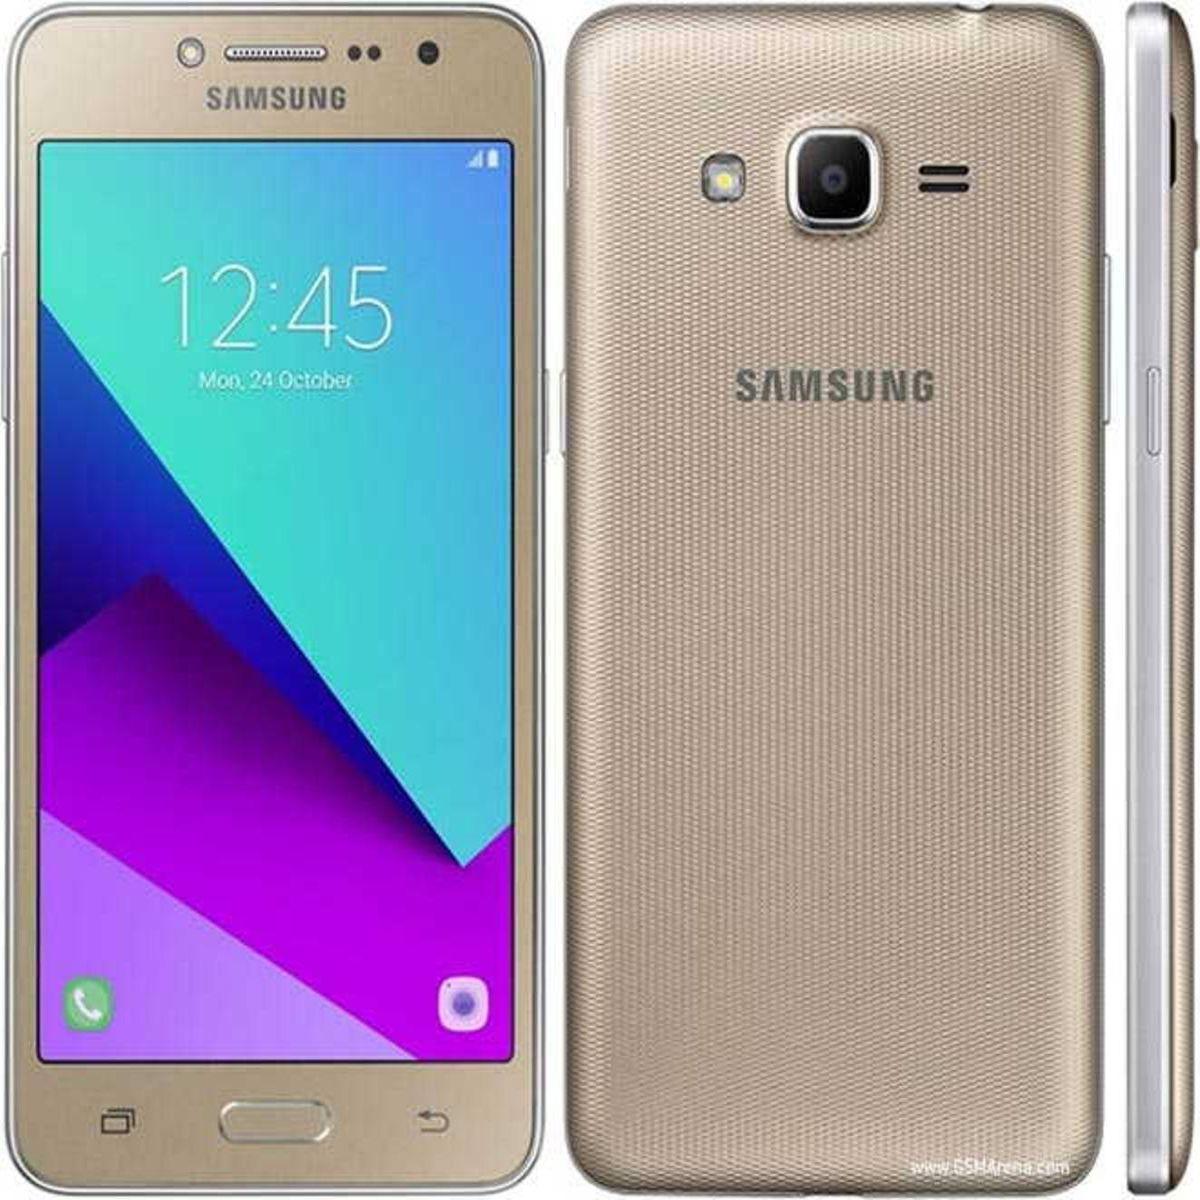 Samsung Galaxy Grand Prime Plus - PriceBol